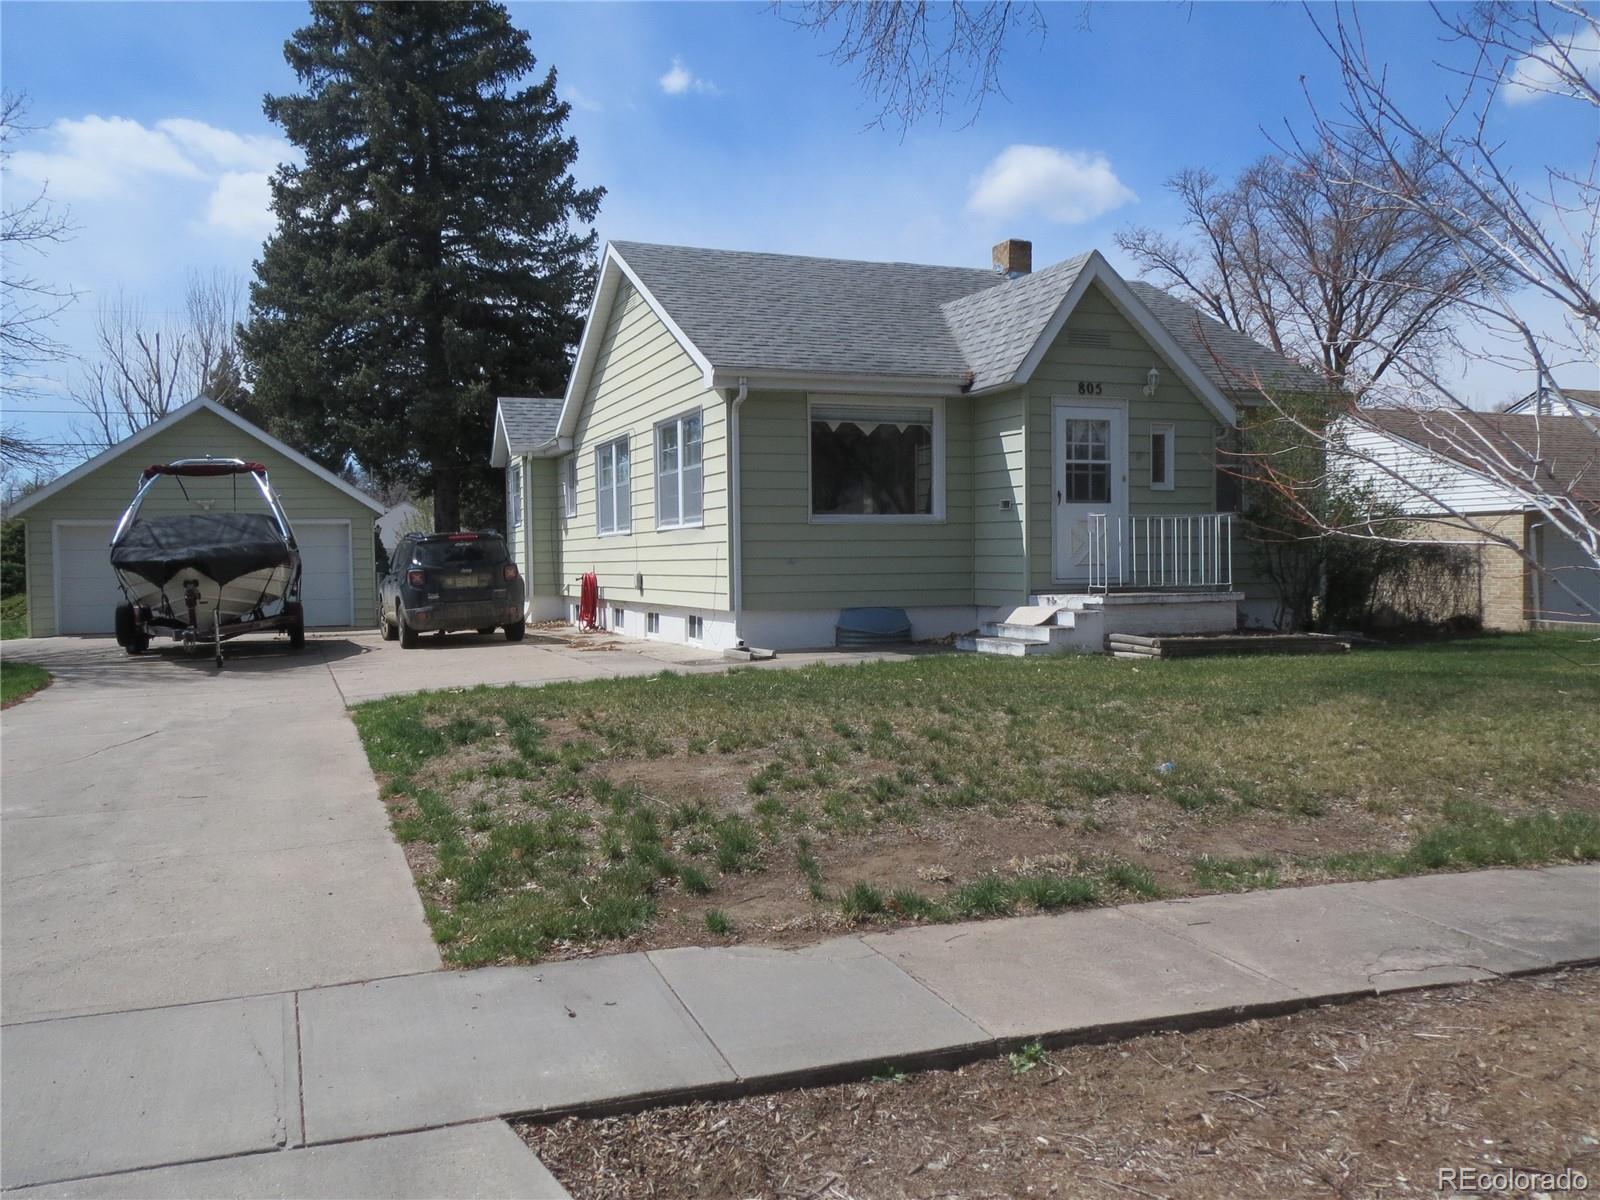 805 Grant Street, Fort Morgan, CO 80701 - Fort Morgan, CO real estate listing